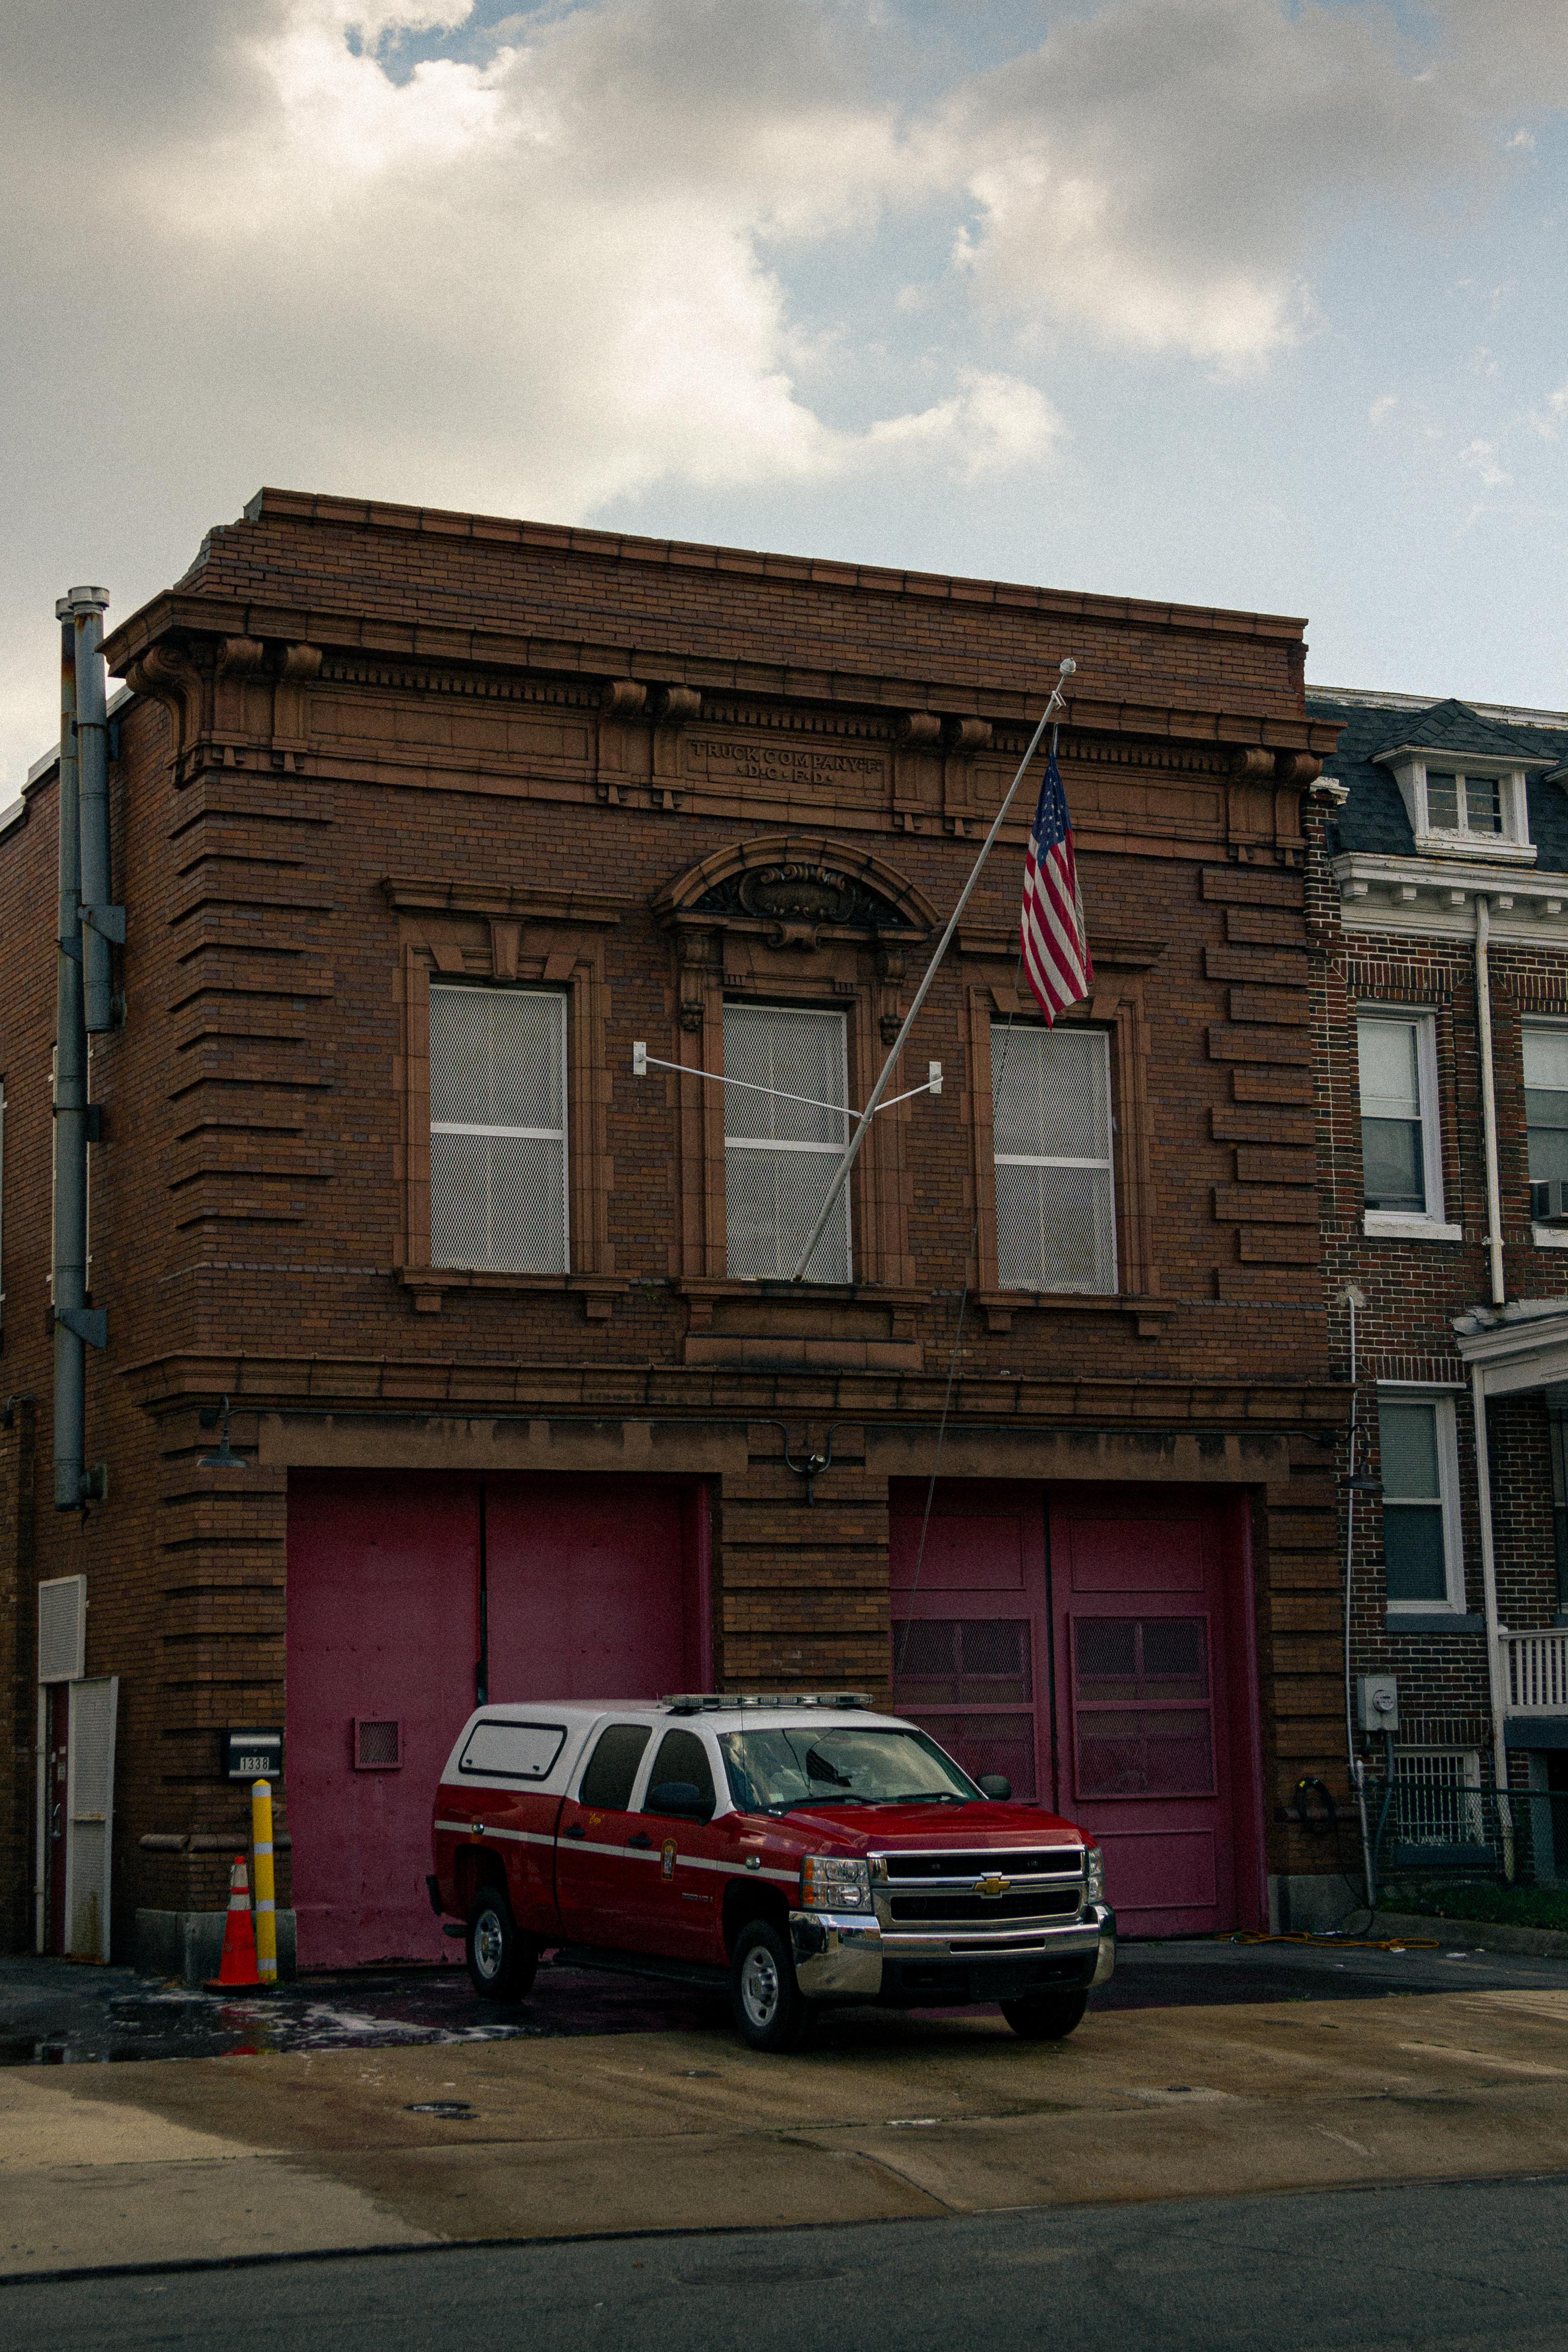 Fire Company F. in Washington D.C.